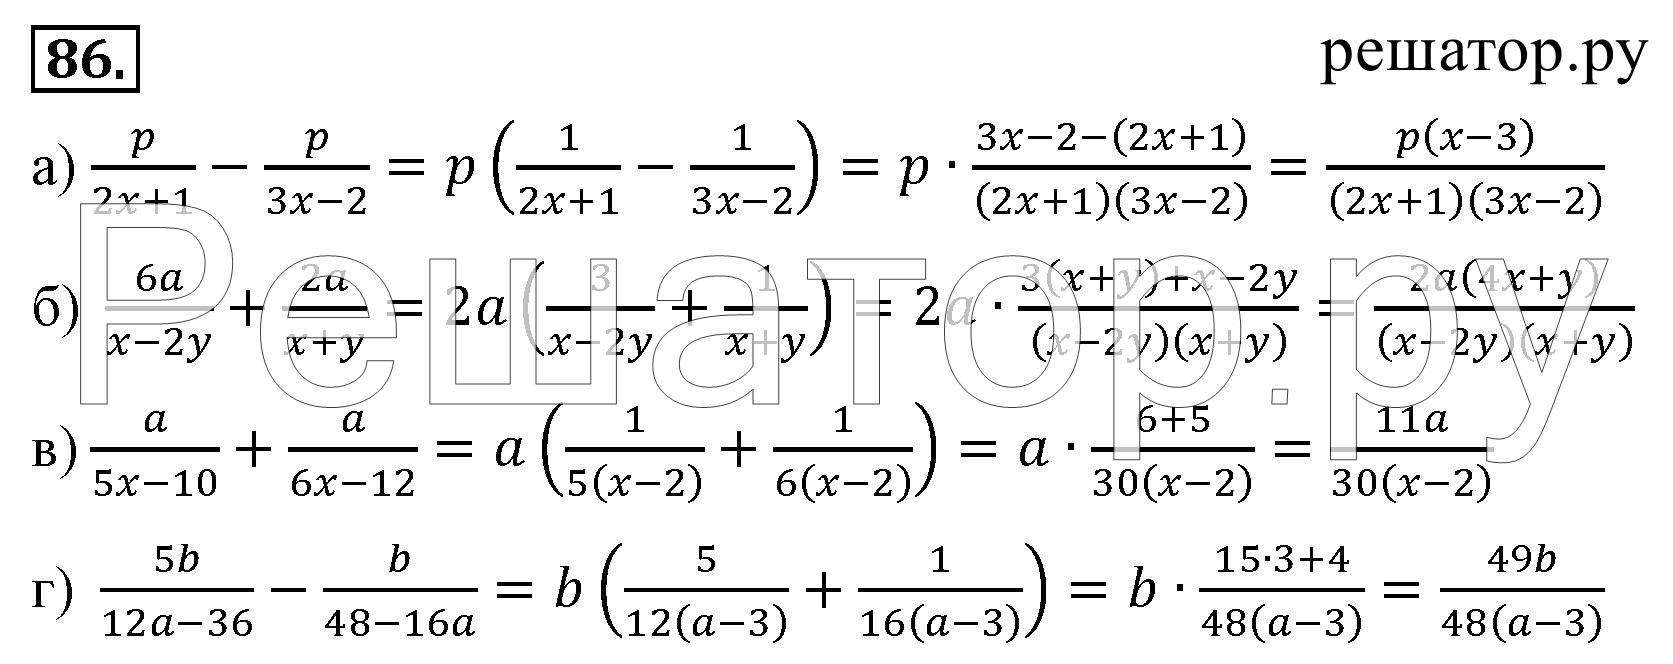 Решебник Алгебра 8 Класс Авторы Макарычев